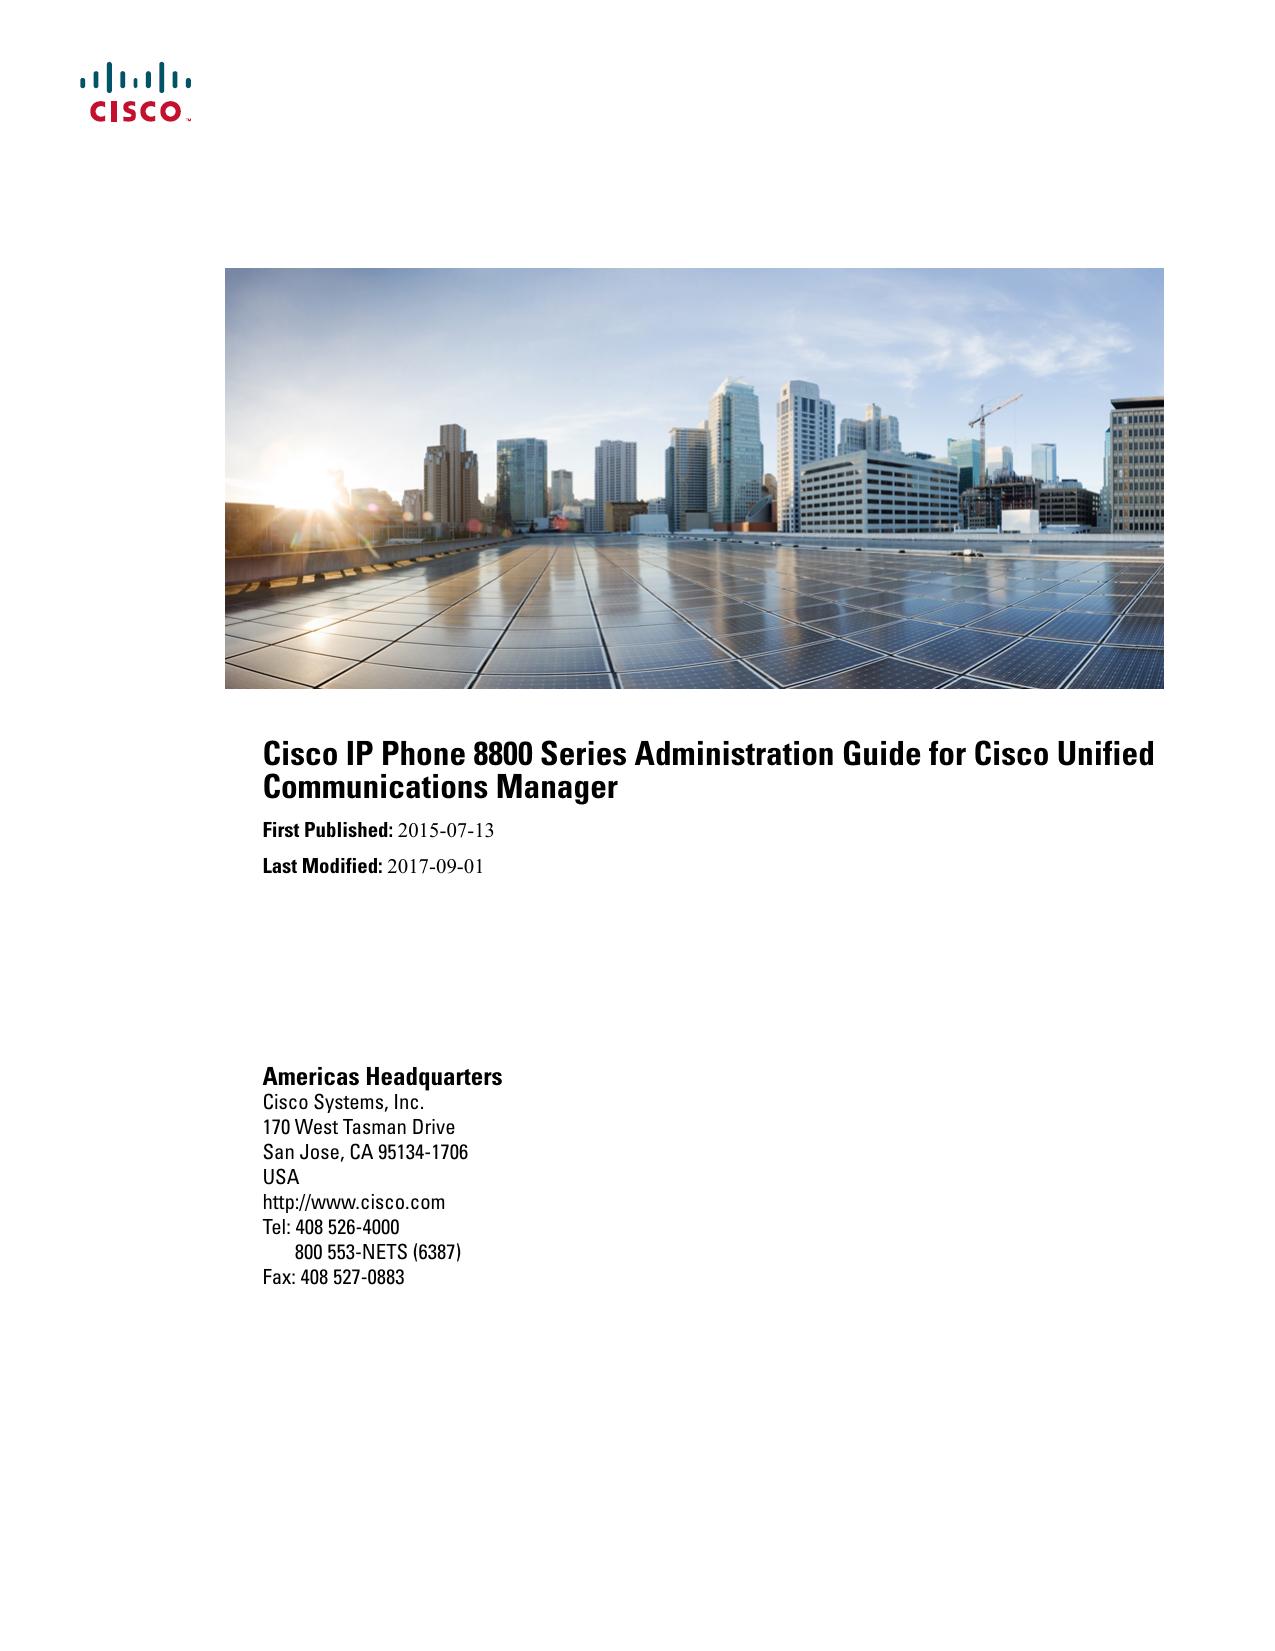 Cisco IP Phone 8800 Series Administration Guide for Cisco